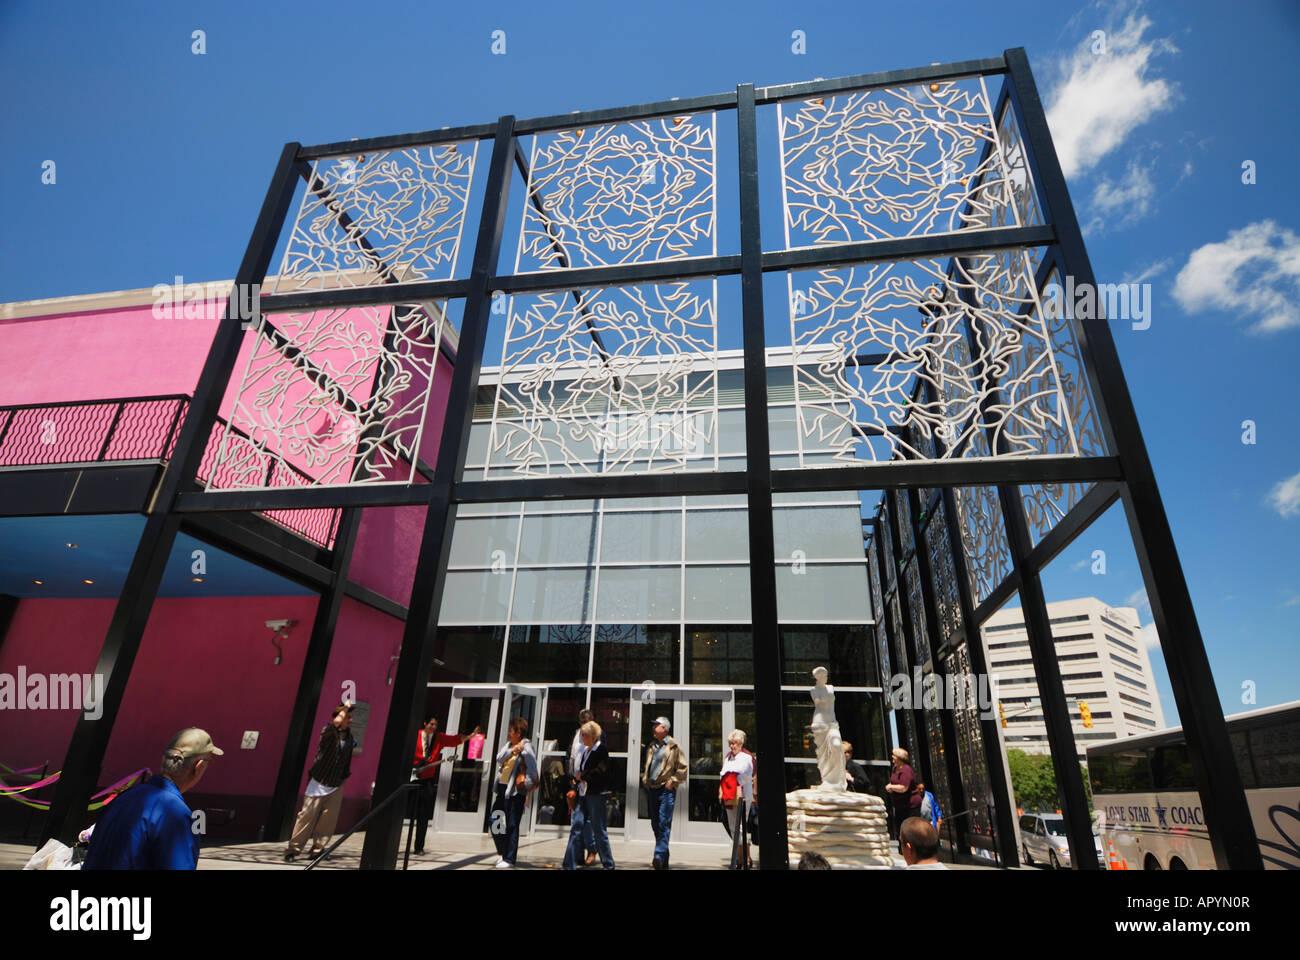 Alameda Smithsonian Museum in San Antonio Texas - Stock Image